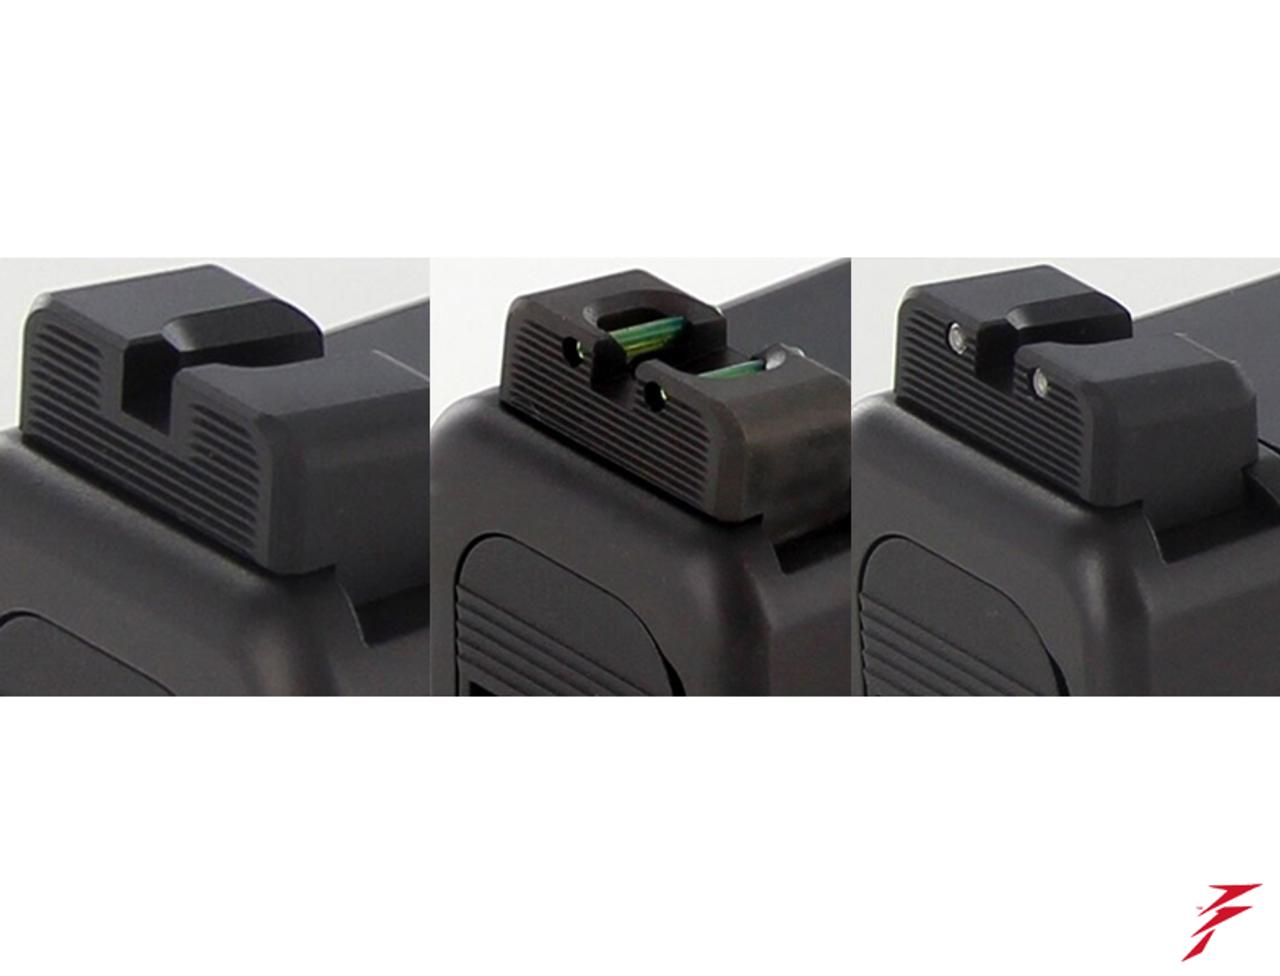 Dawson Precision Glock MOS Fixed Non Co-Witness Sights